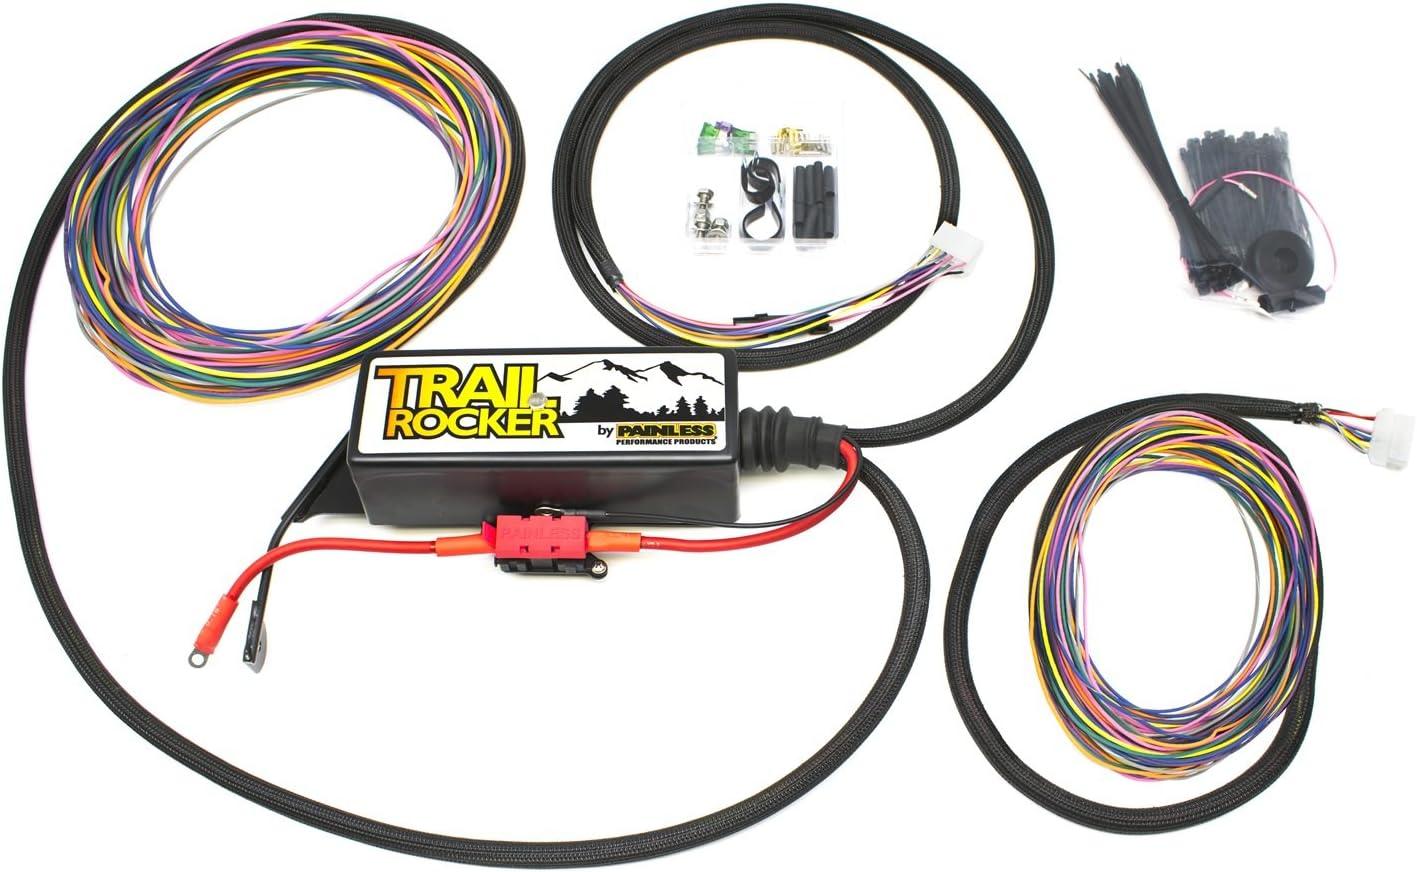 painless performance wiring diagram amazon com painless performance 57005 trail rocker relay center  painless performance 57005 trail rocker